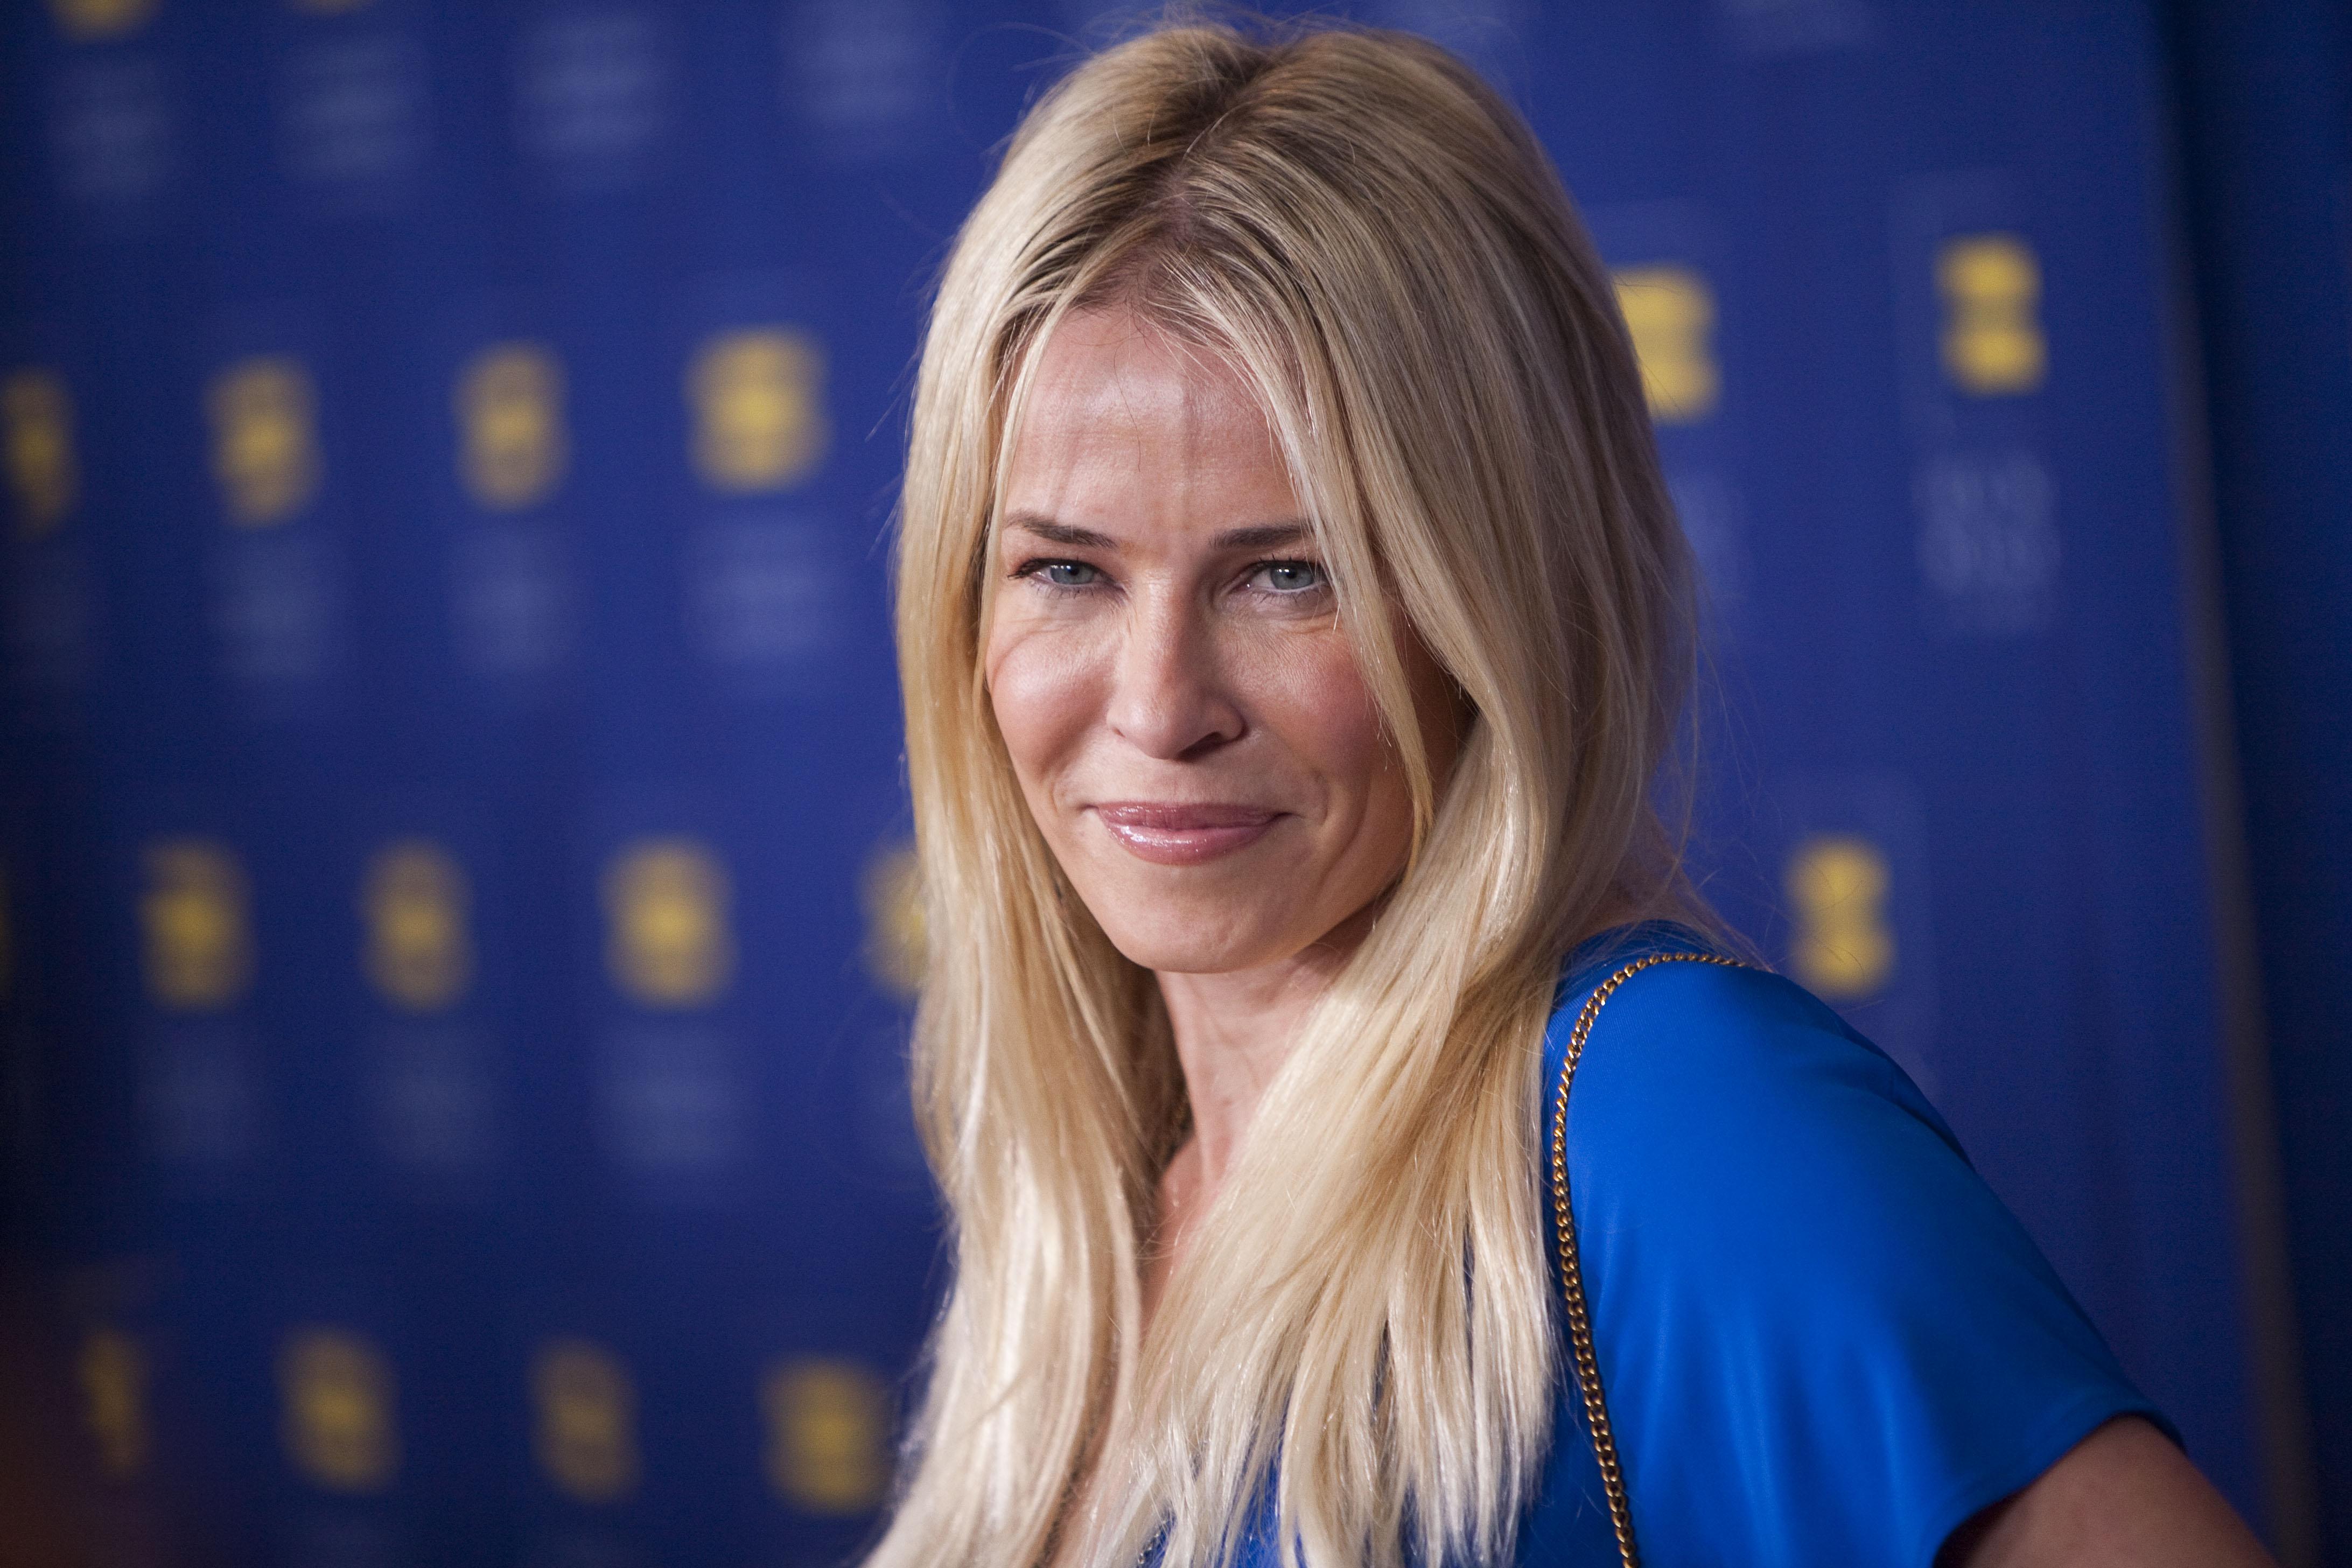 Chelsea Handler S New App To Avoid Stupid Meetings Fortune